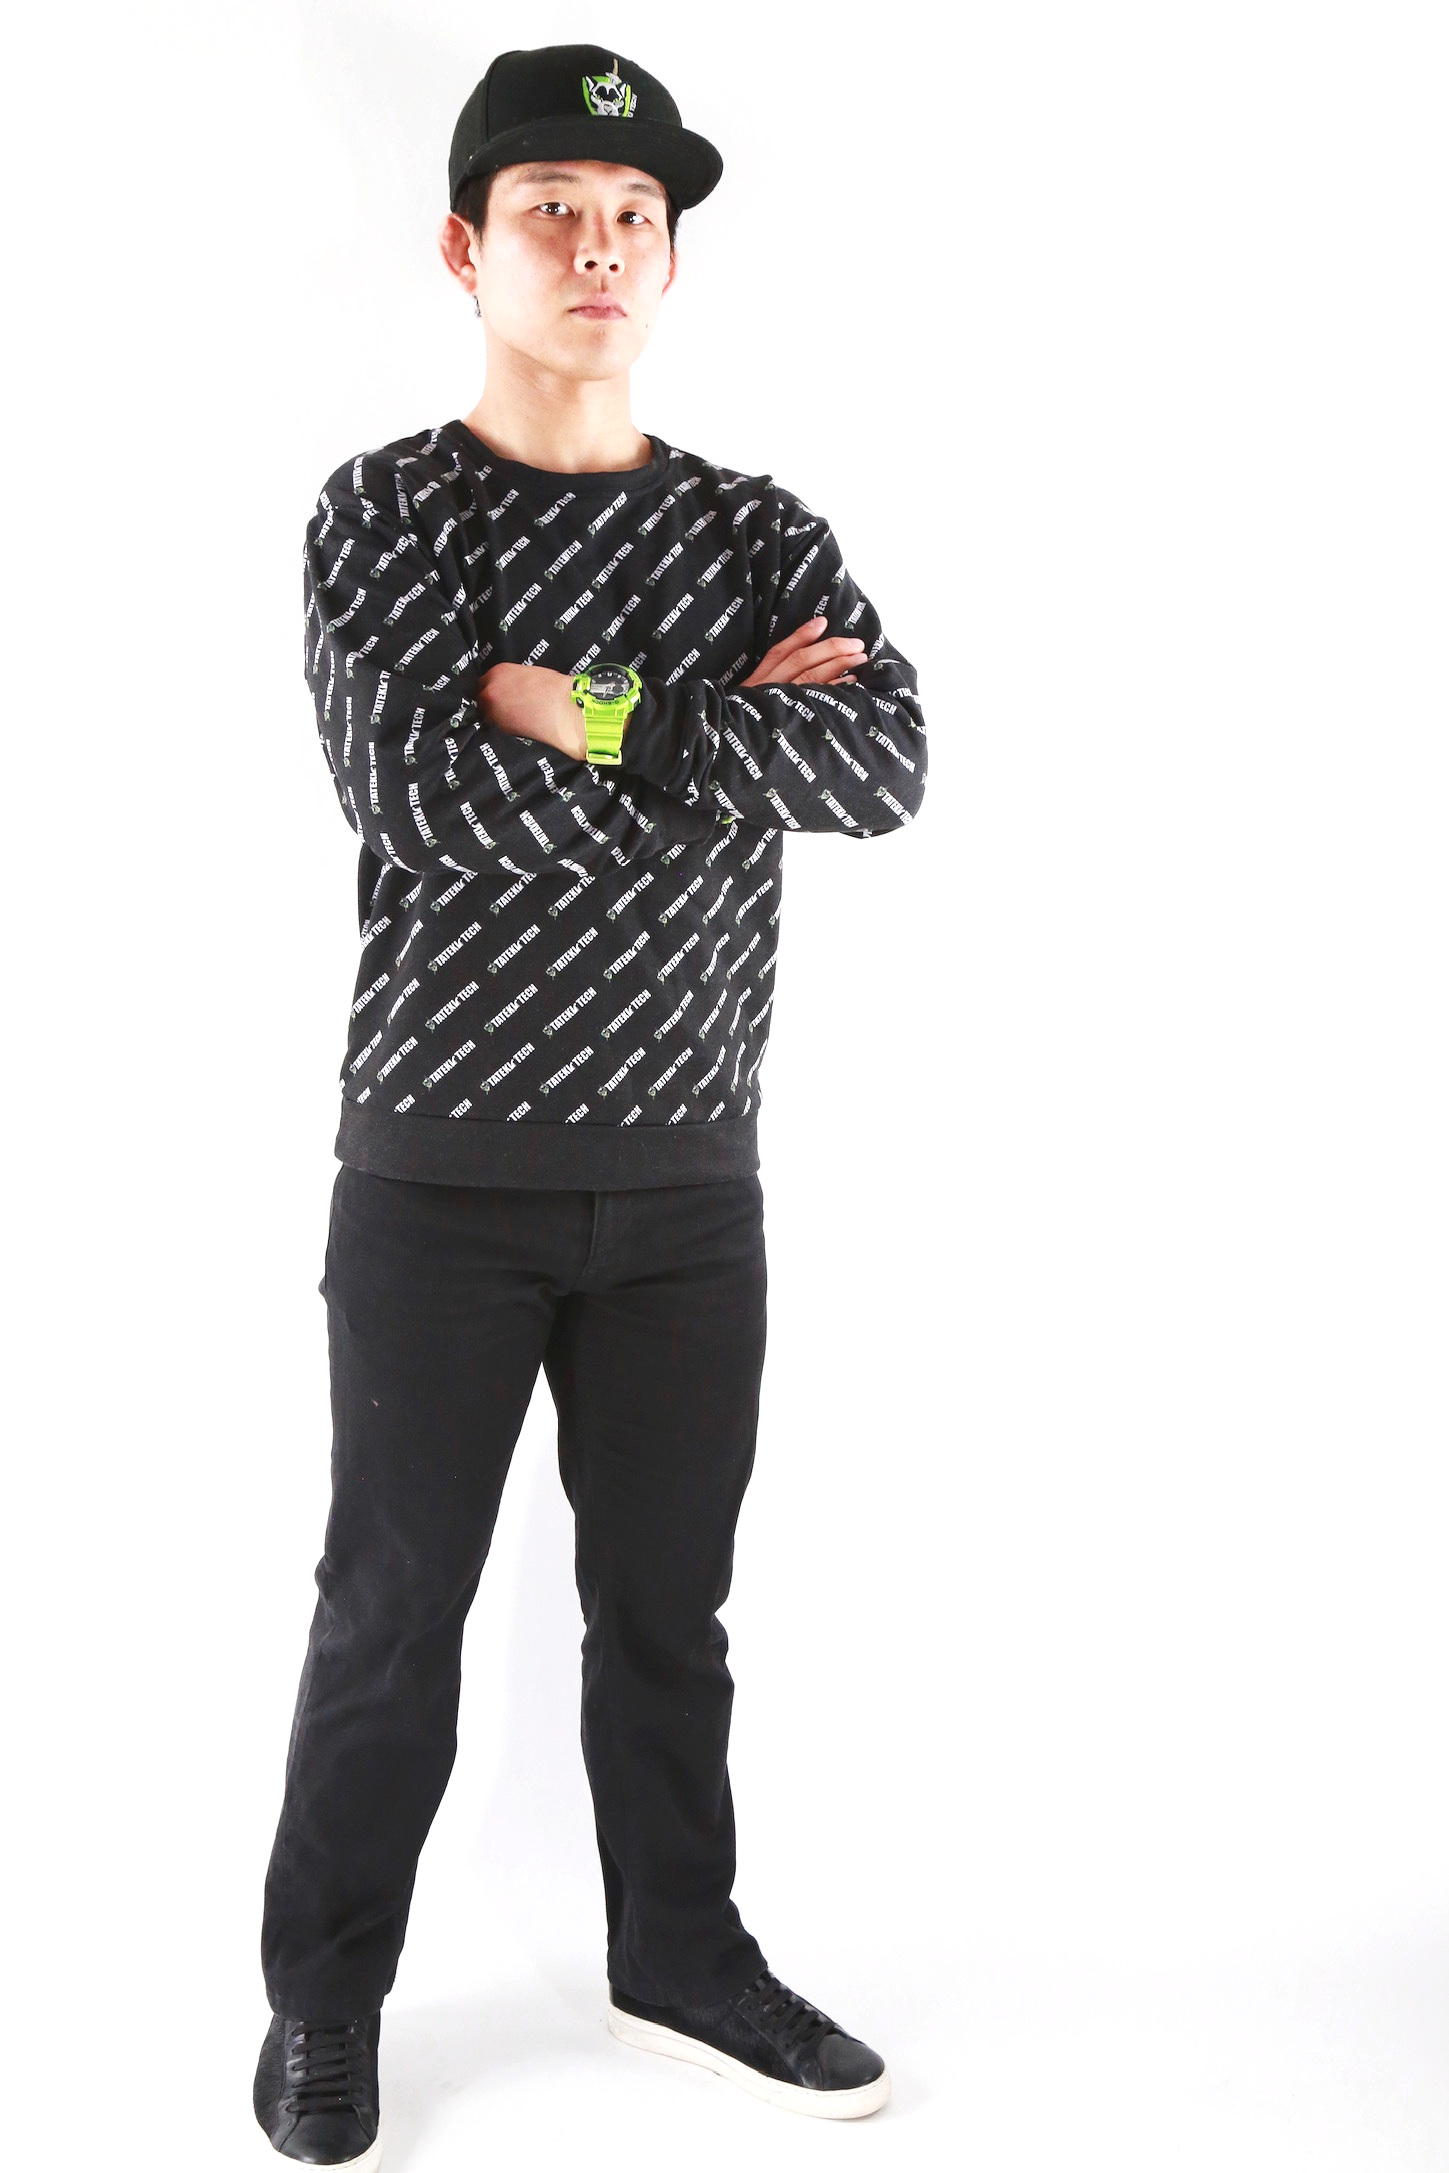 All Over Sweatshirt by Tateki Tech